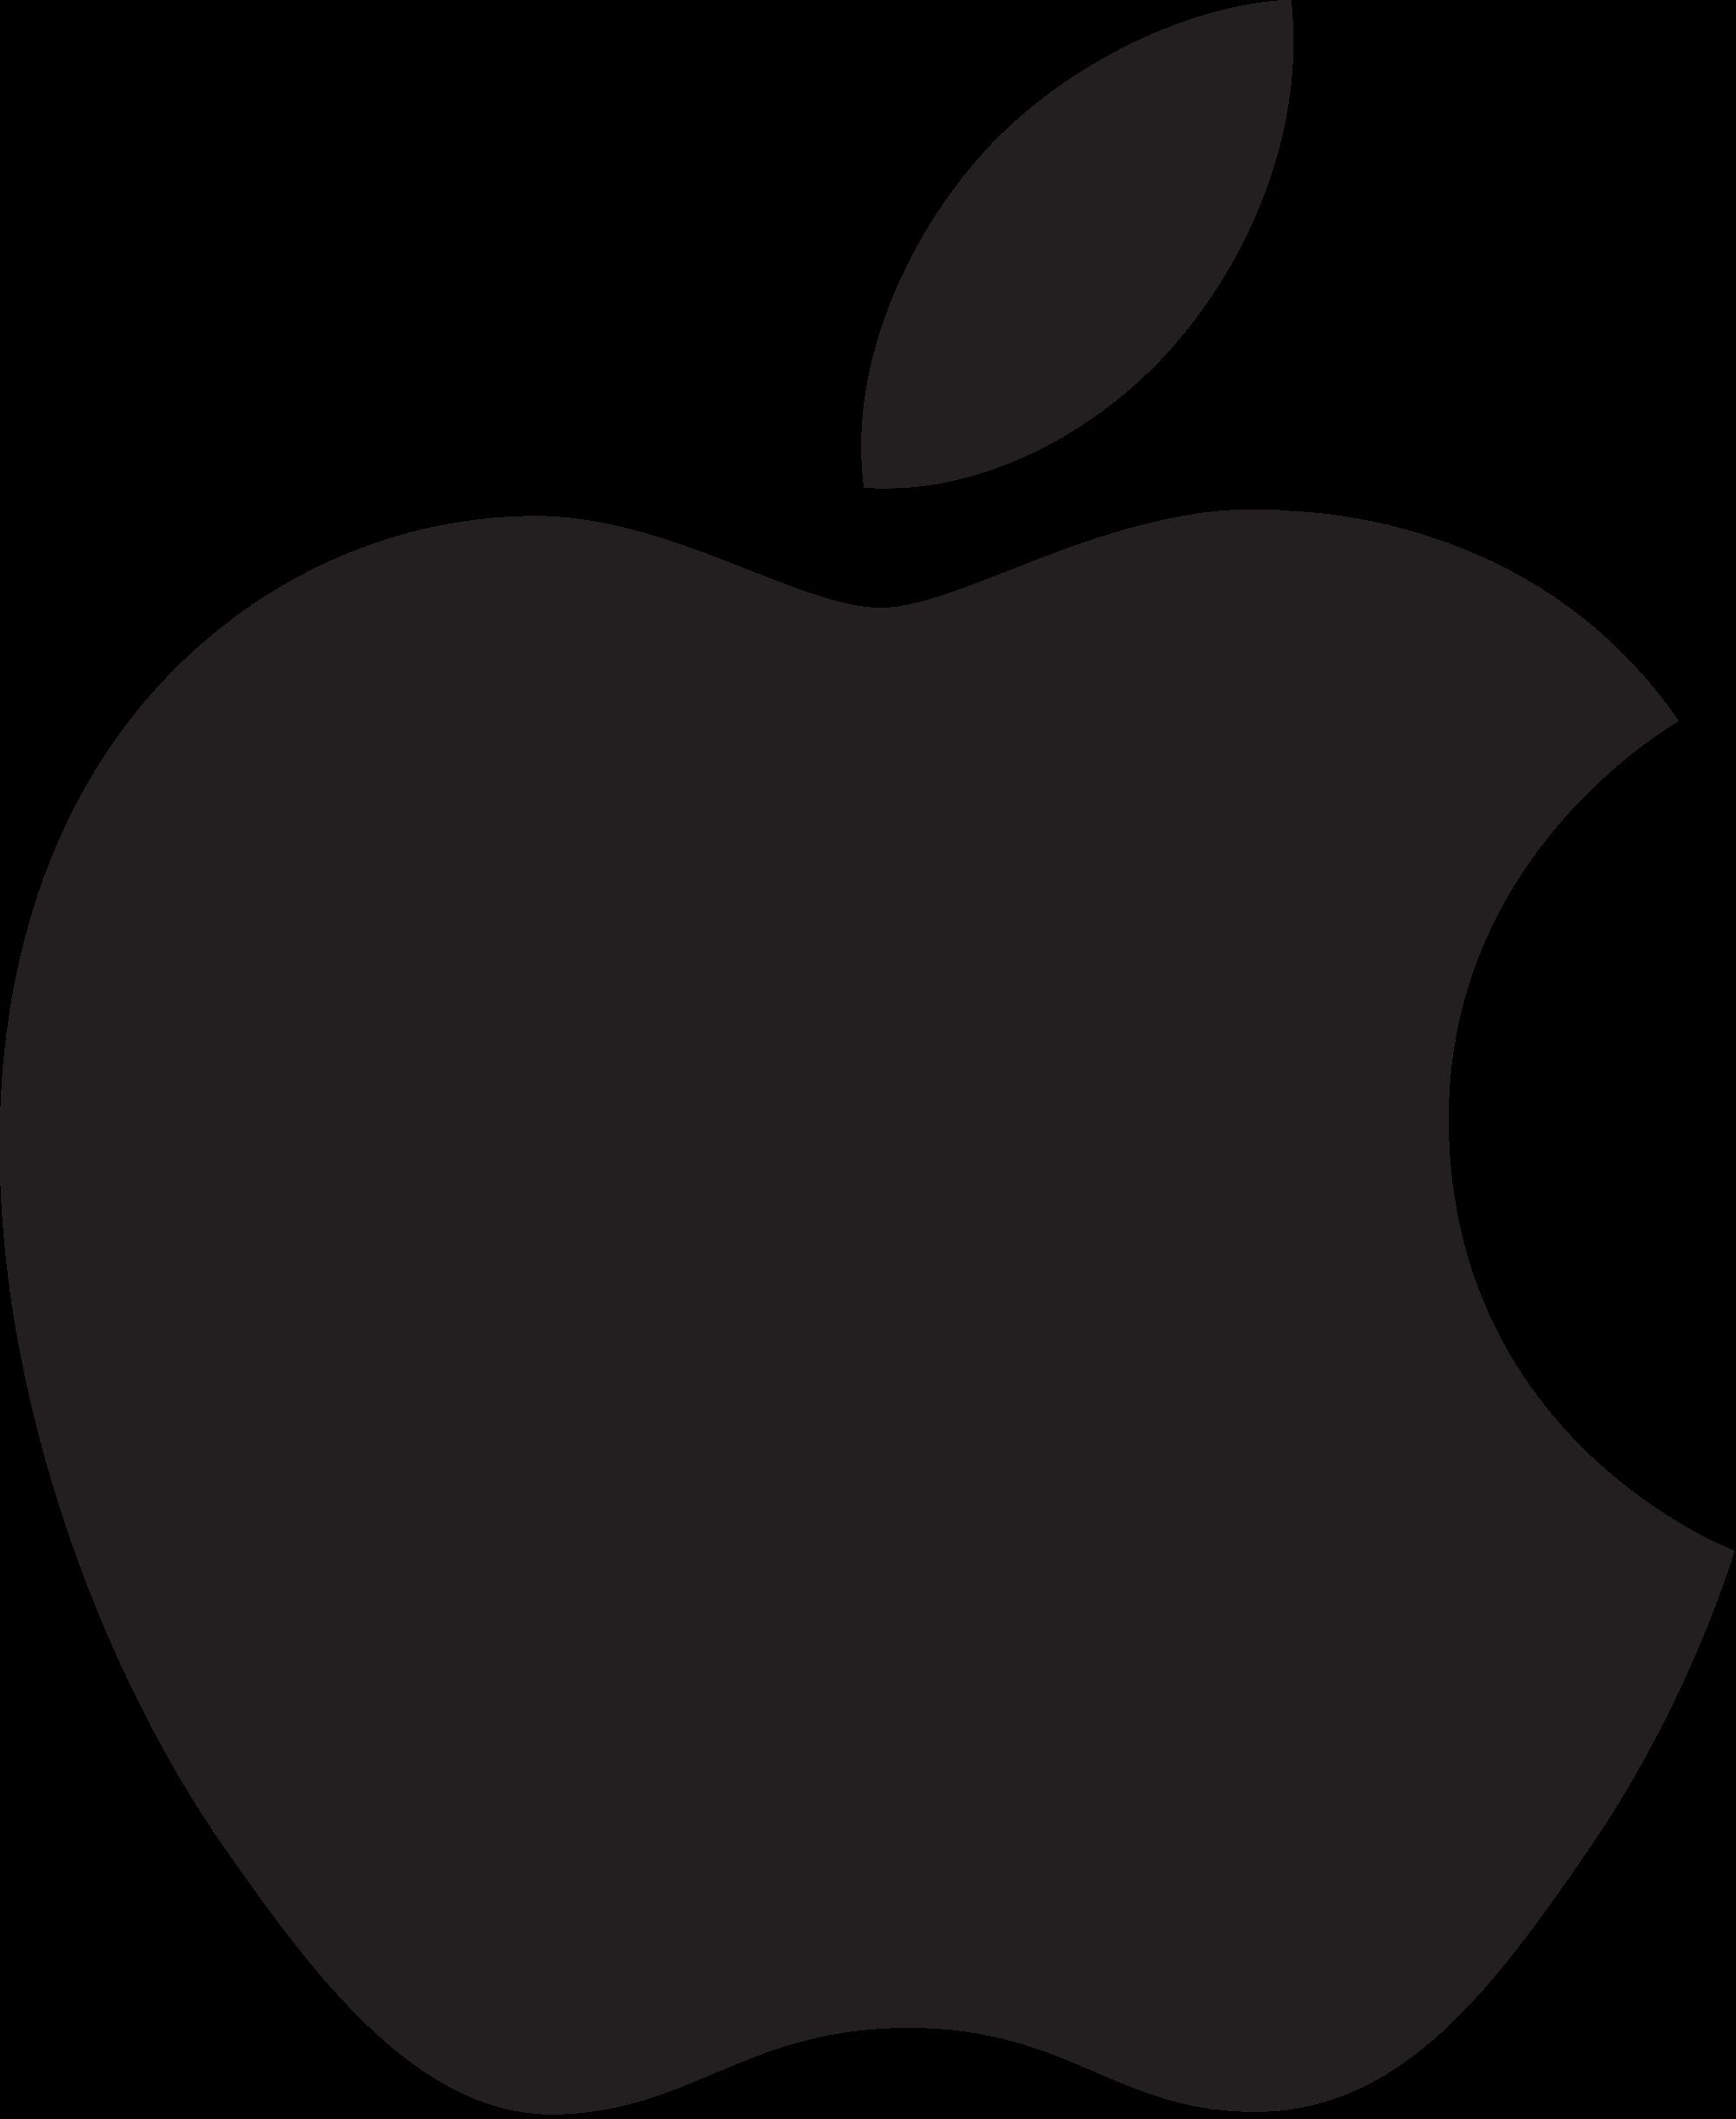 Apple Inc. clipart Apple Inc by Wikia Wiki